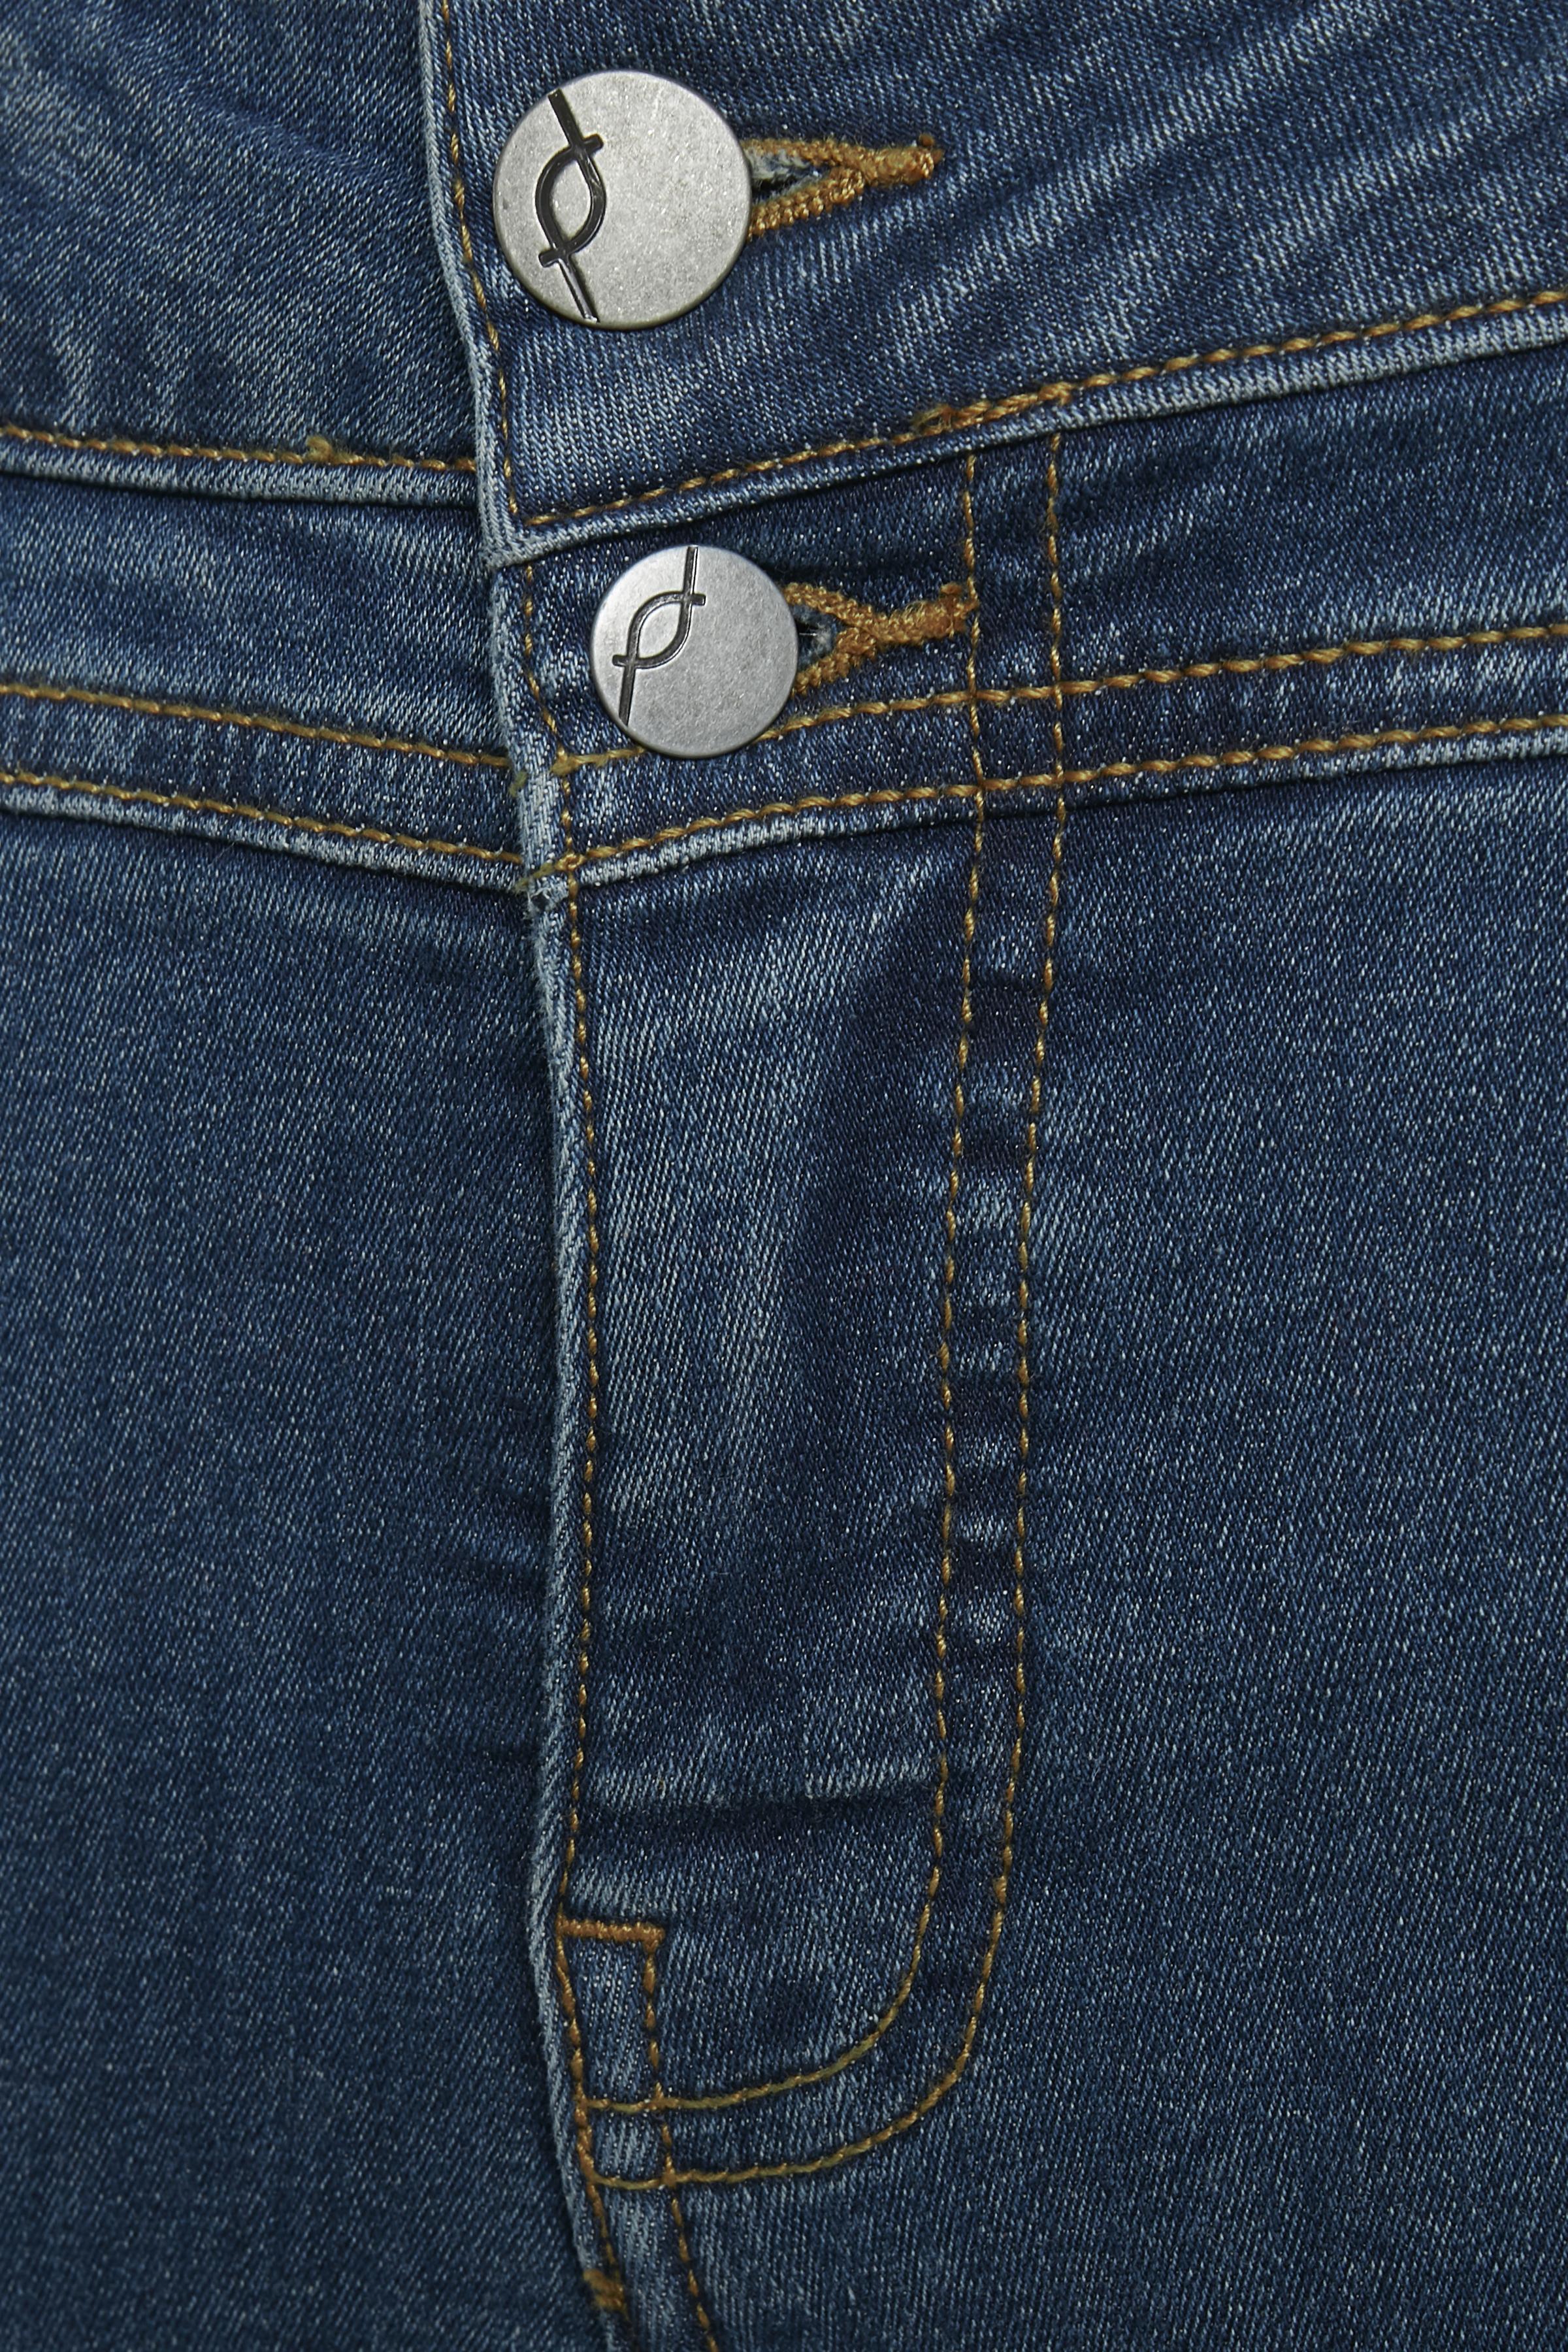 Denimblau Denimhose von Fransa – Shoppen Sie Denimblau Denimhose ab Gr. 32-46 hier